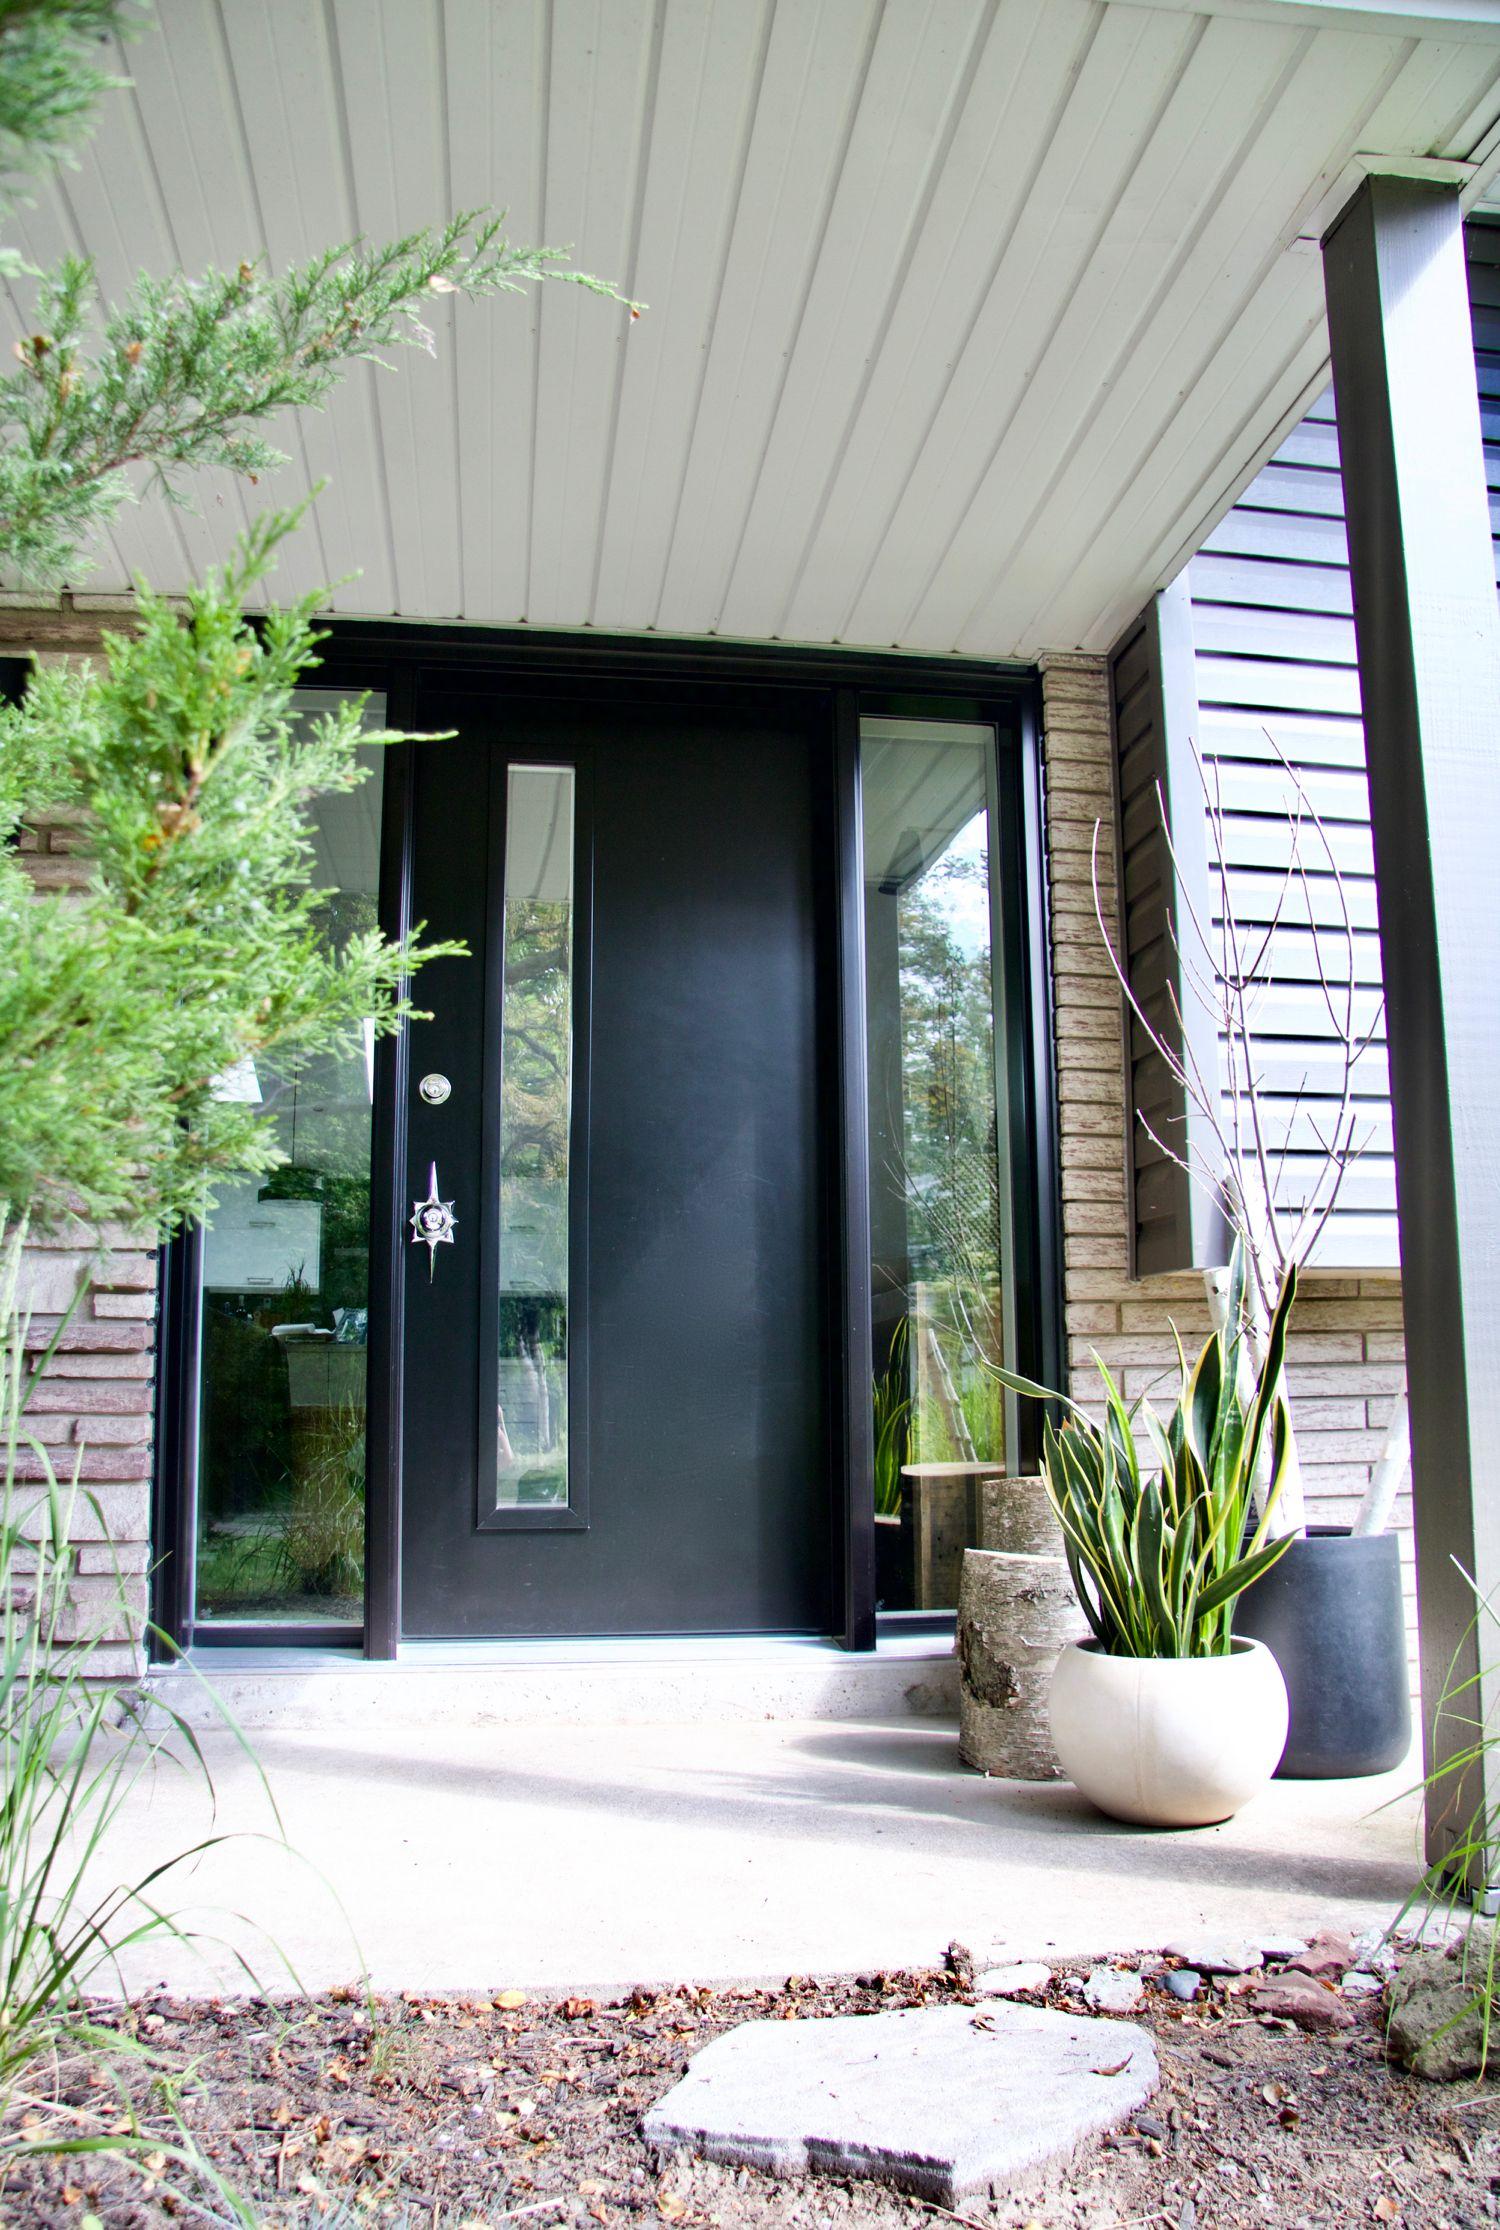 Mid Century Modern Ceiling Light Fixture: Mid-Century Modern Door